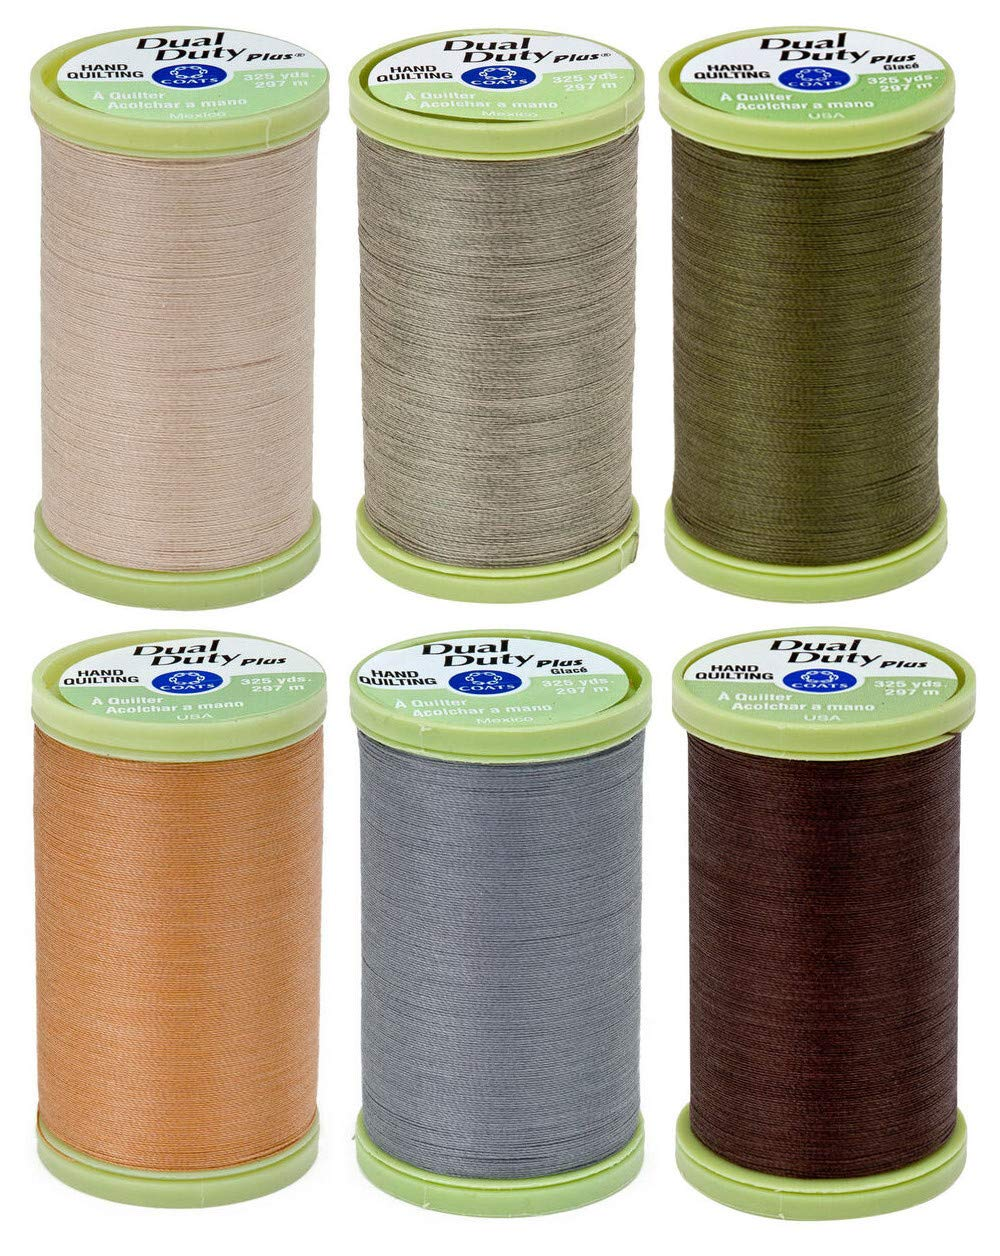 2-Pack Bundle Coats /& Clark Dual Duty Plus Hand Quilting Thread 325yds Field Green s960-6670